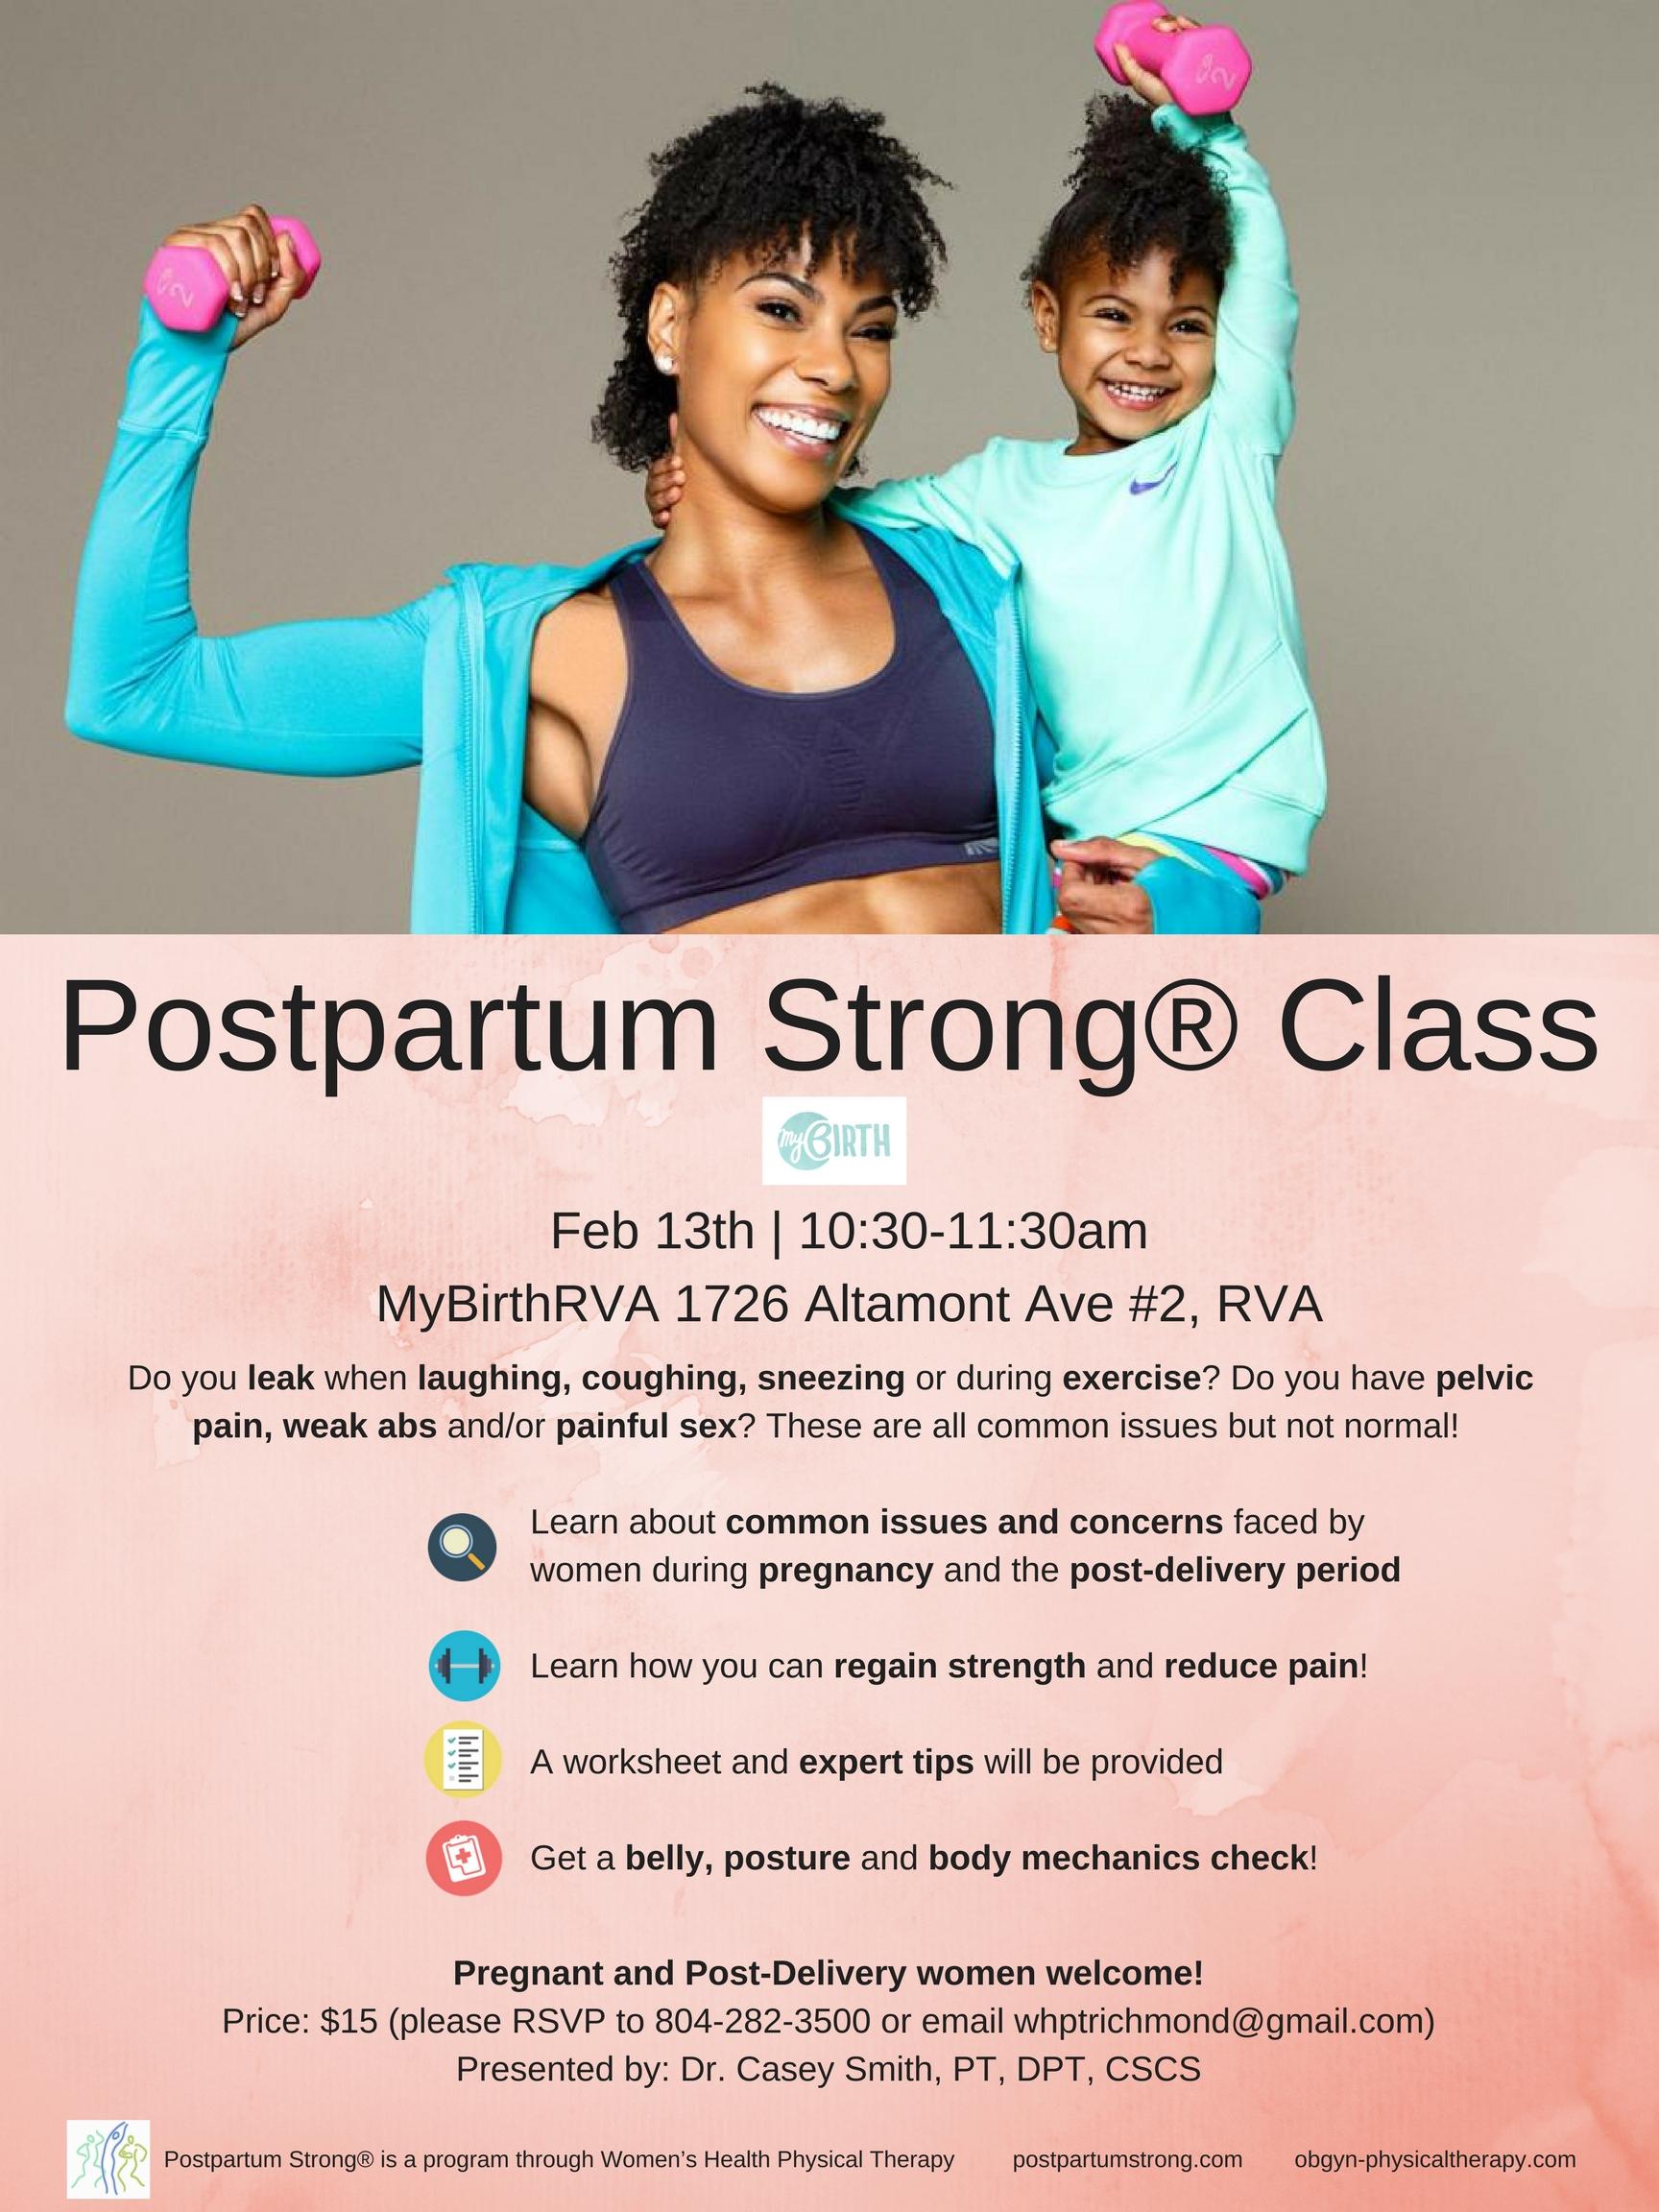 PostpartumStrong Class.jpg